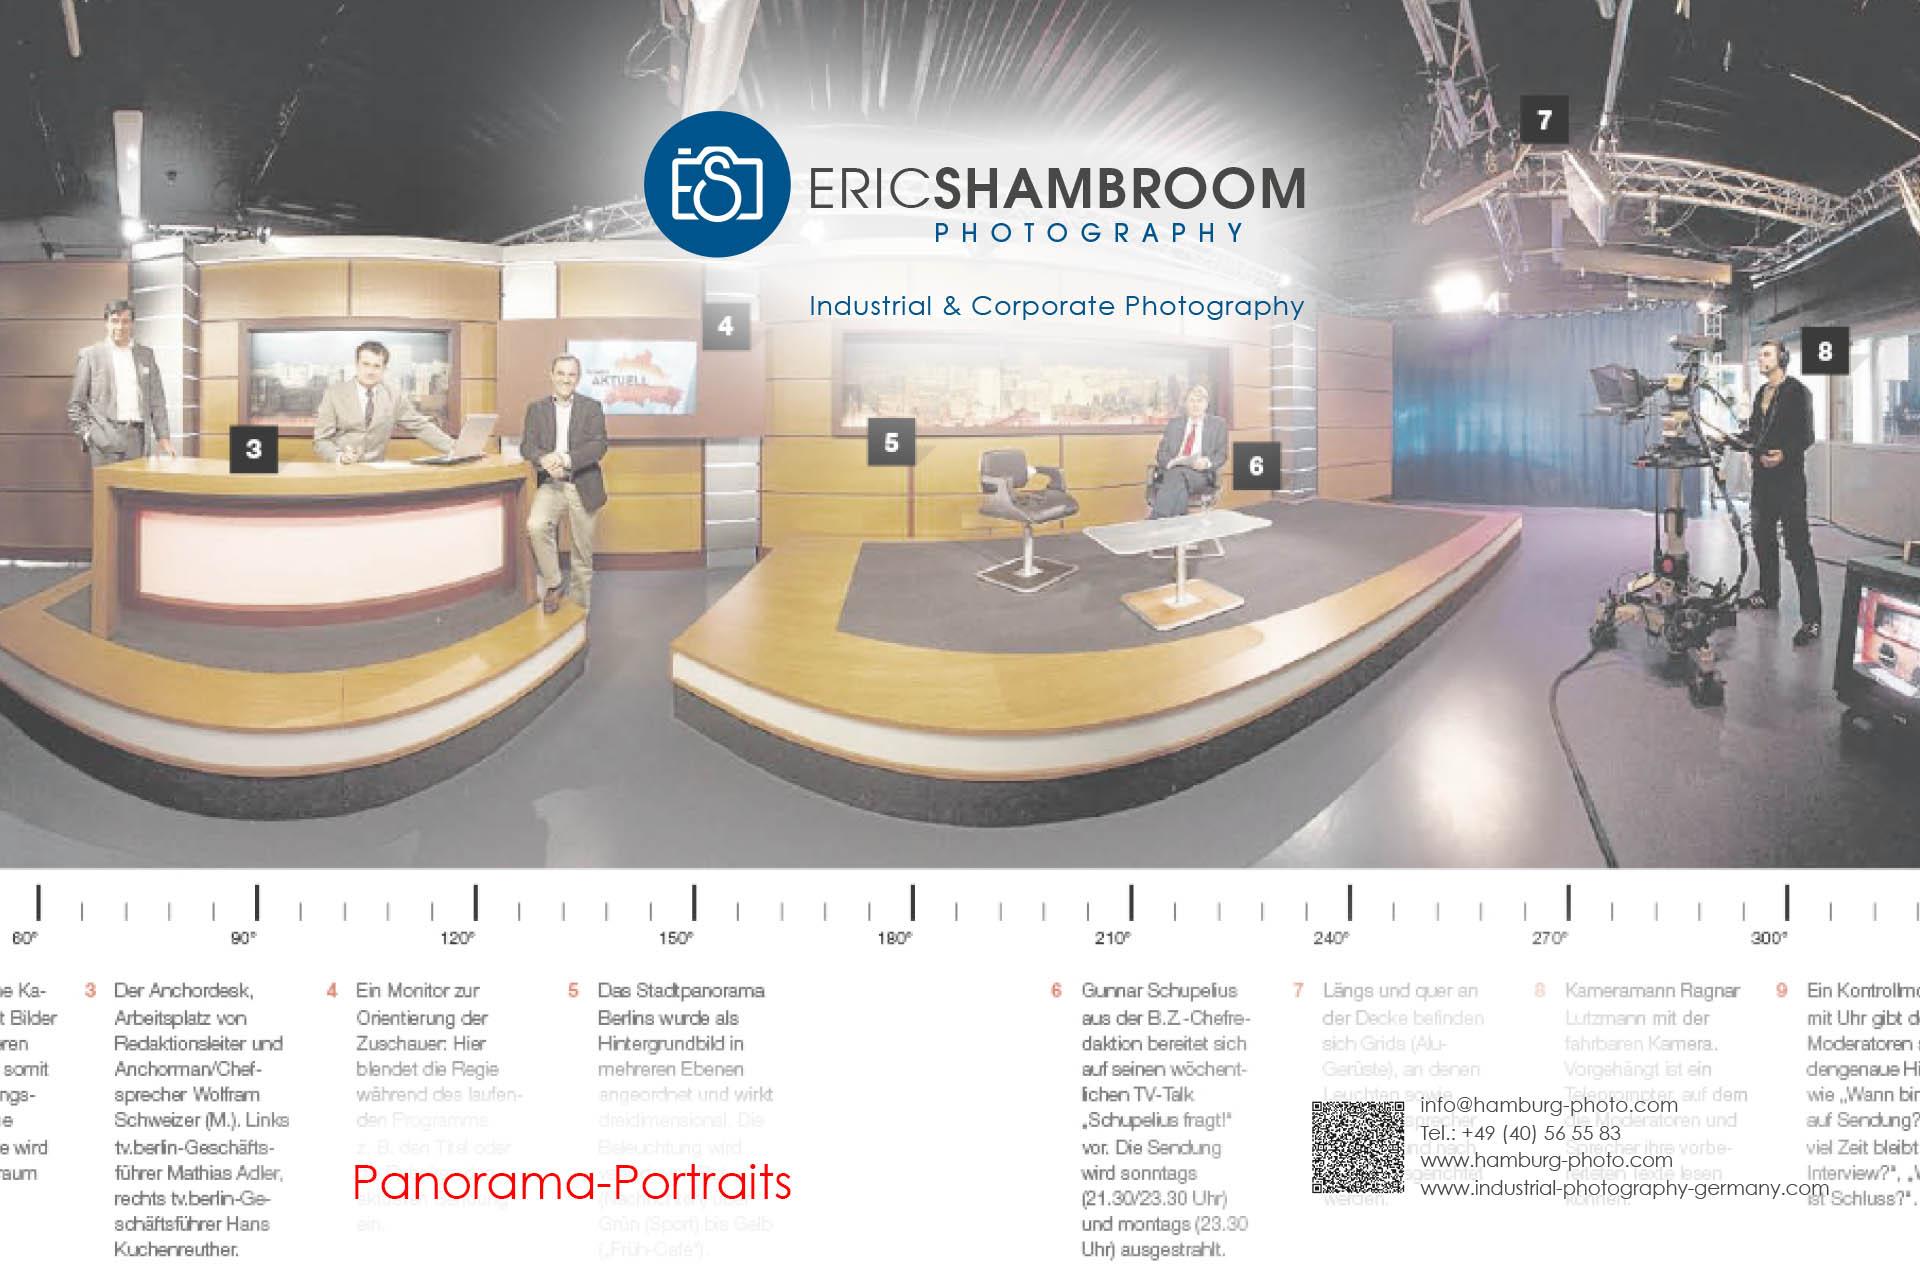 Eric Shambroom Photography Portfolio: Panorama 360 Degree Portraits